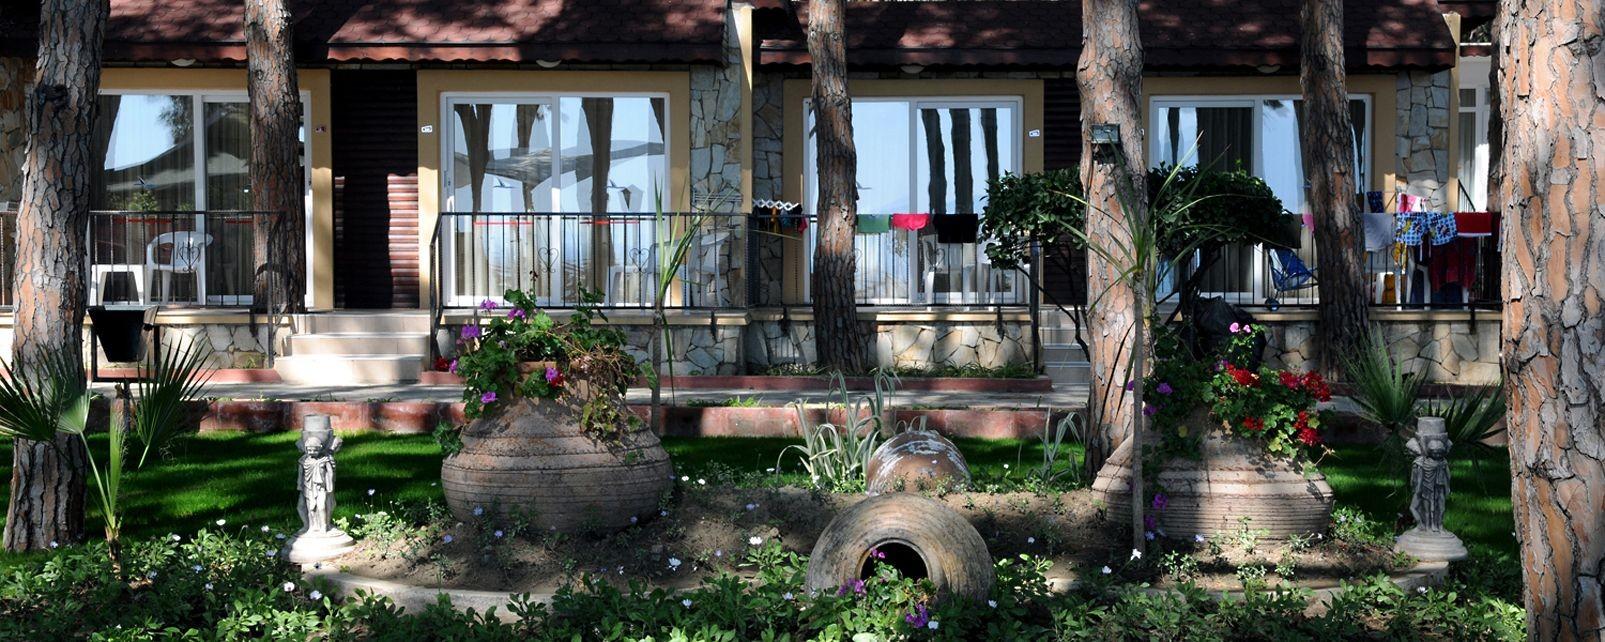 Omer Holiday Village - градина